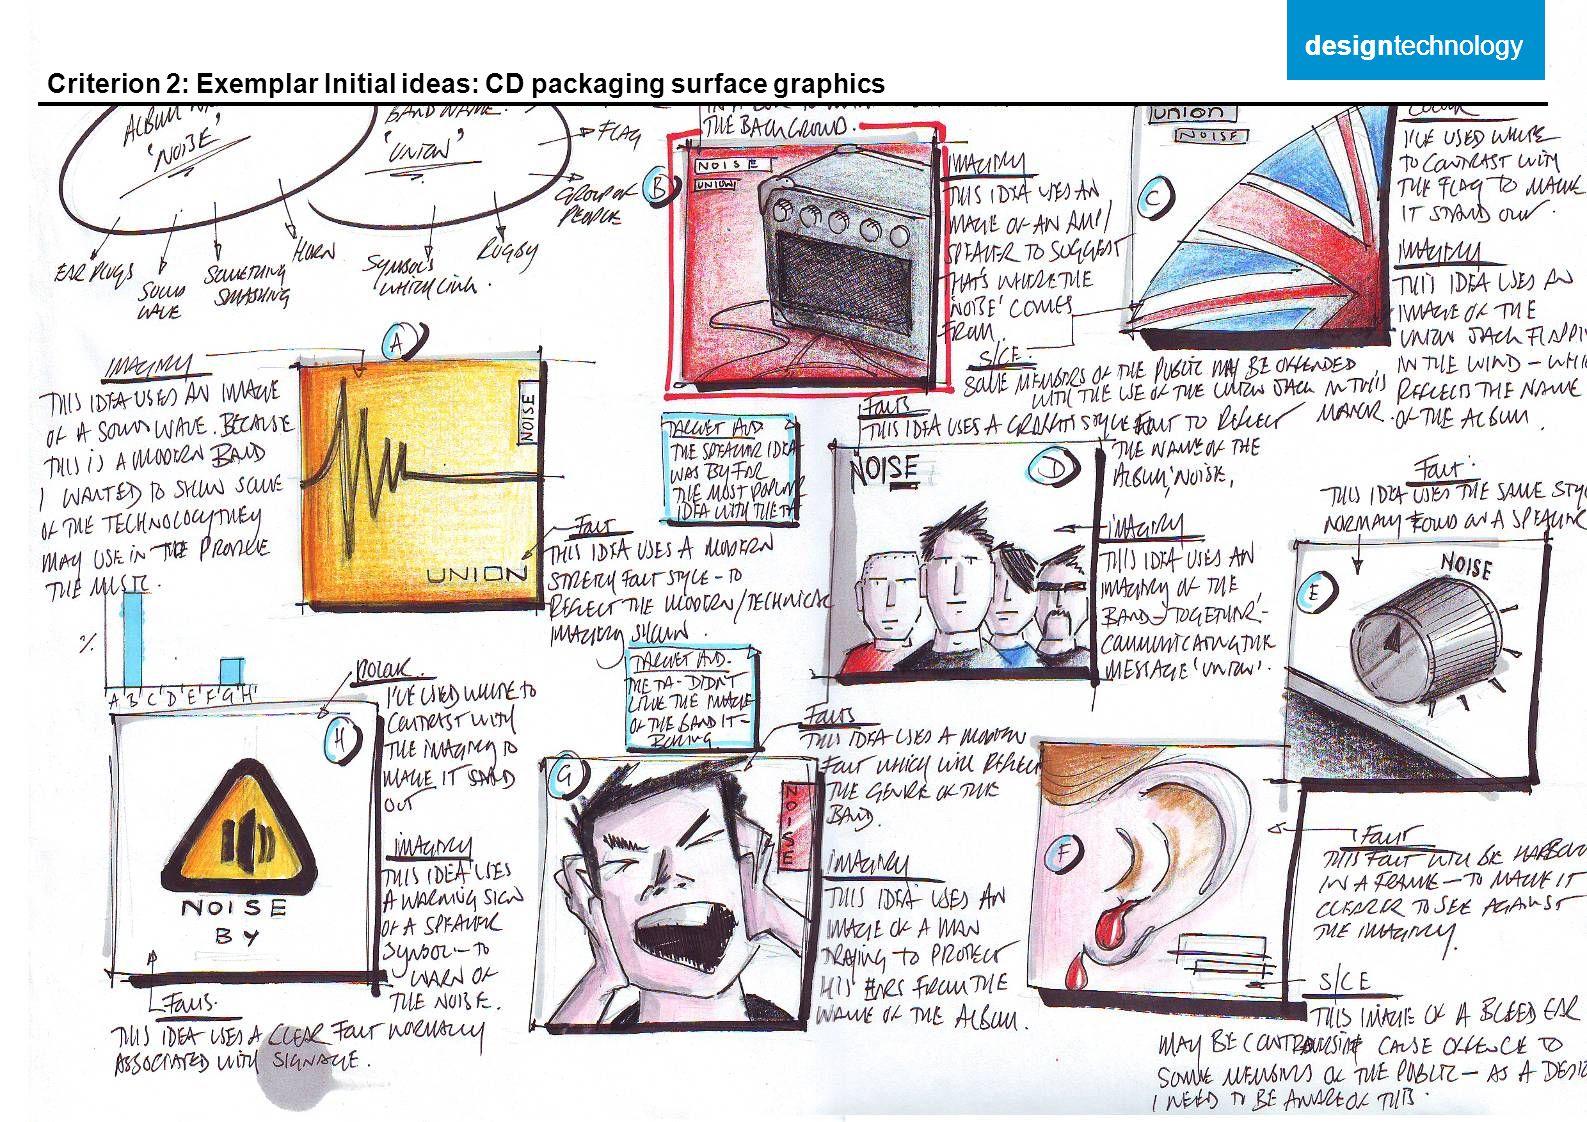 Criterion 2: Exemplar Initial ideas: CD packaging surface graphics designtechnology